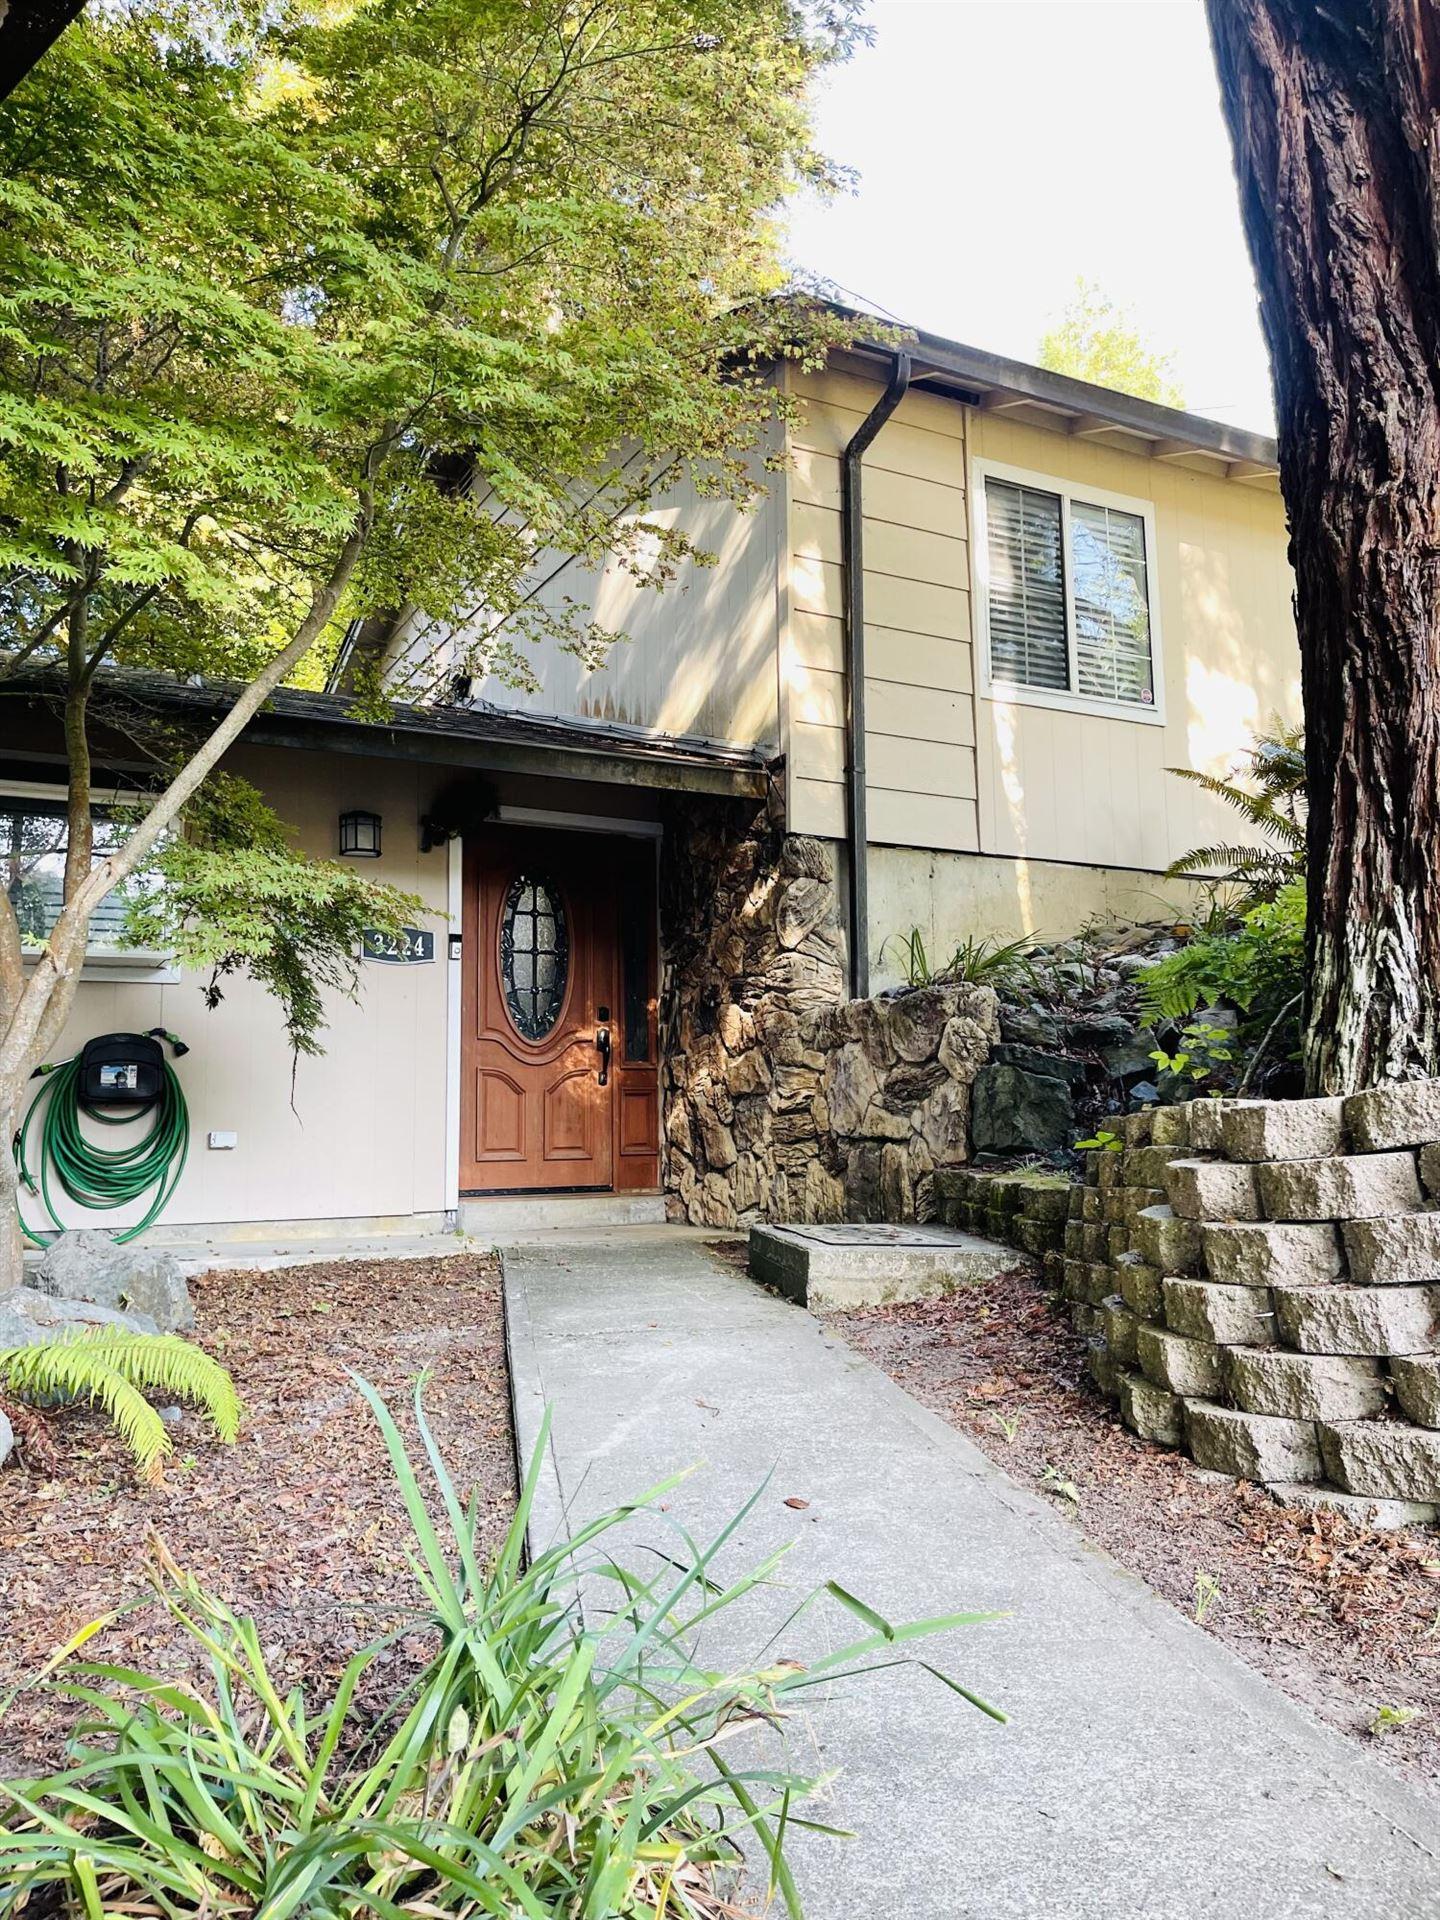 3224 C Street, Eureka, CA 95503 - MLS#: 260089